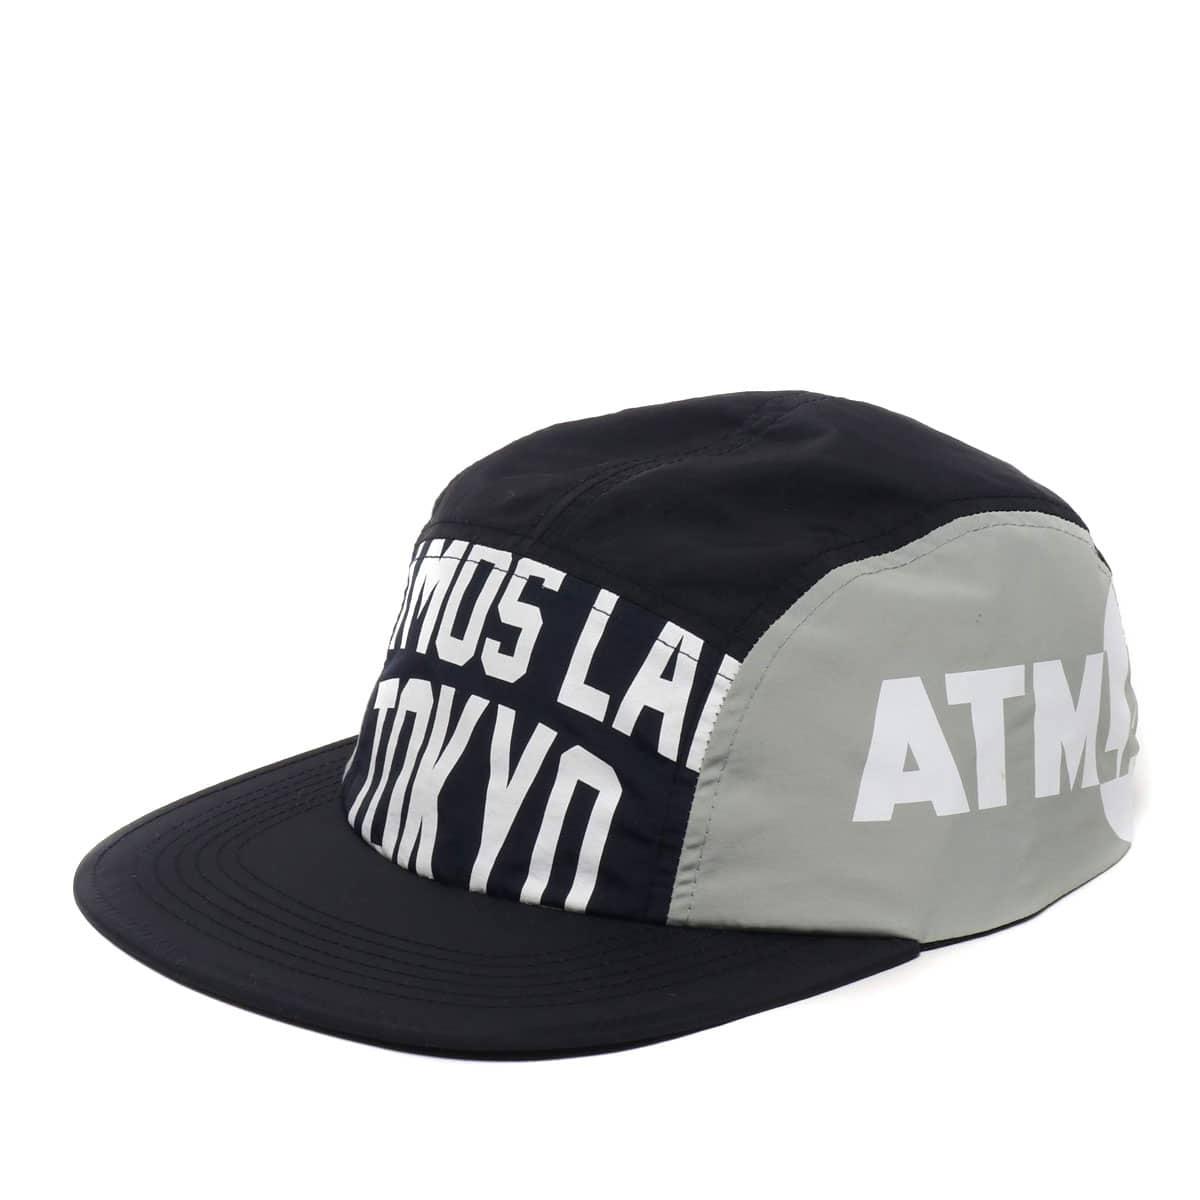 ATMOS LAB SWITCH CAMP CAP BLACK 19FA-I_photo_large